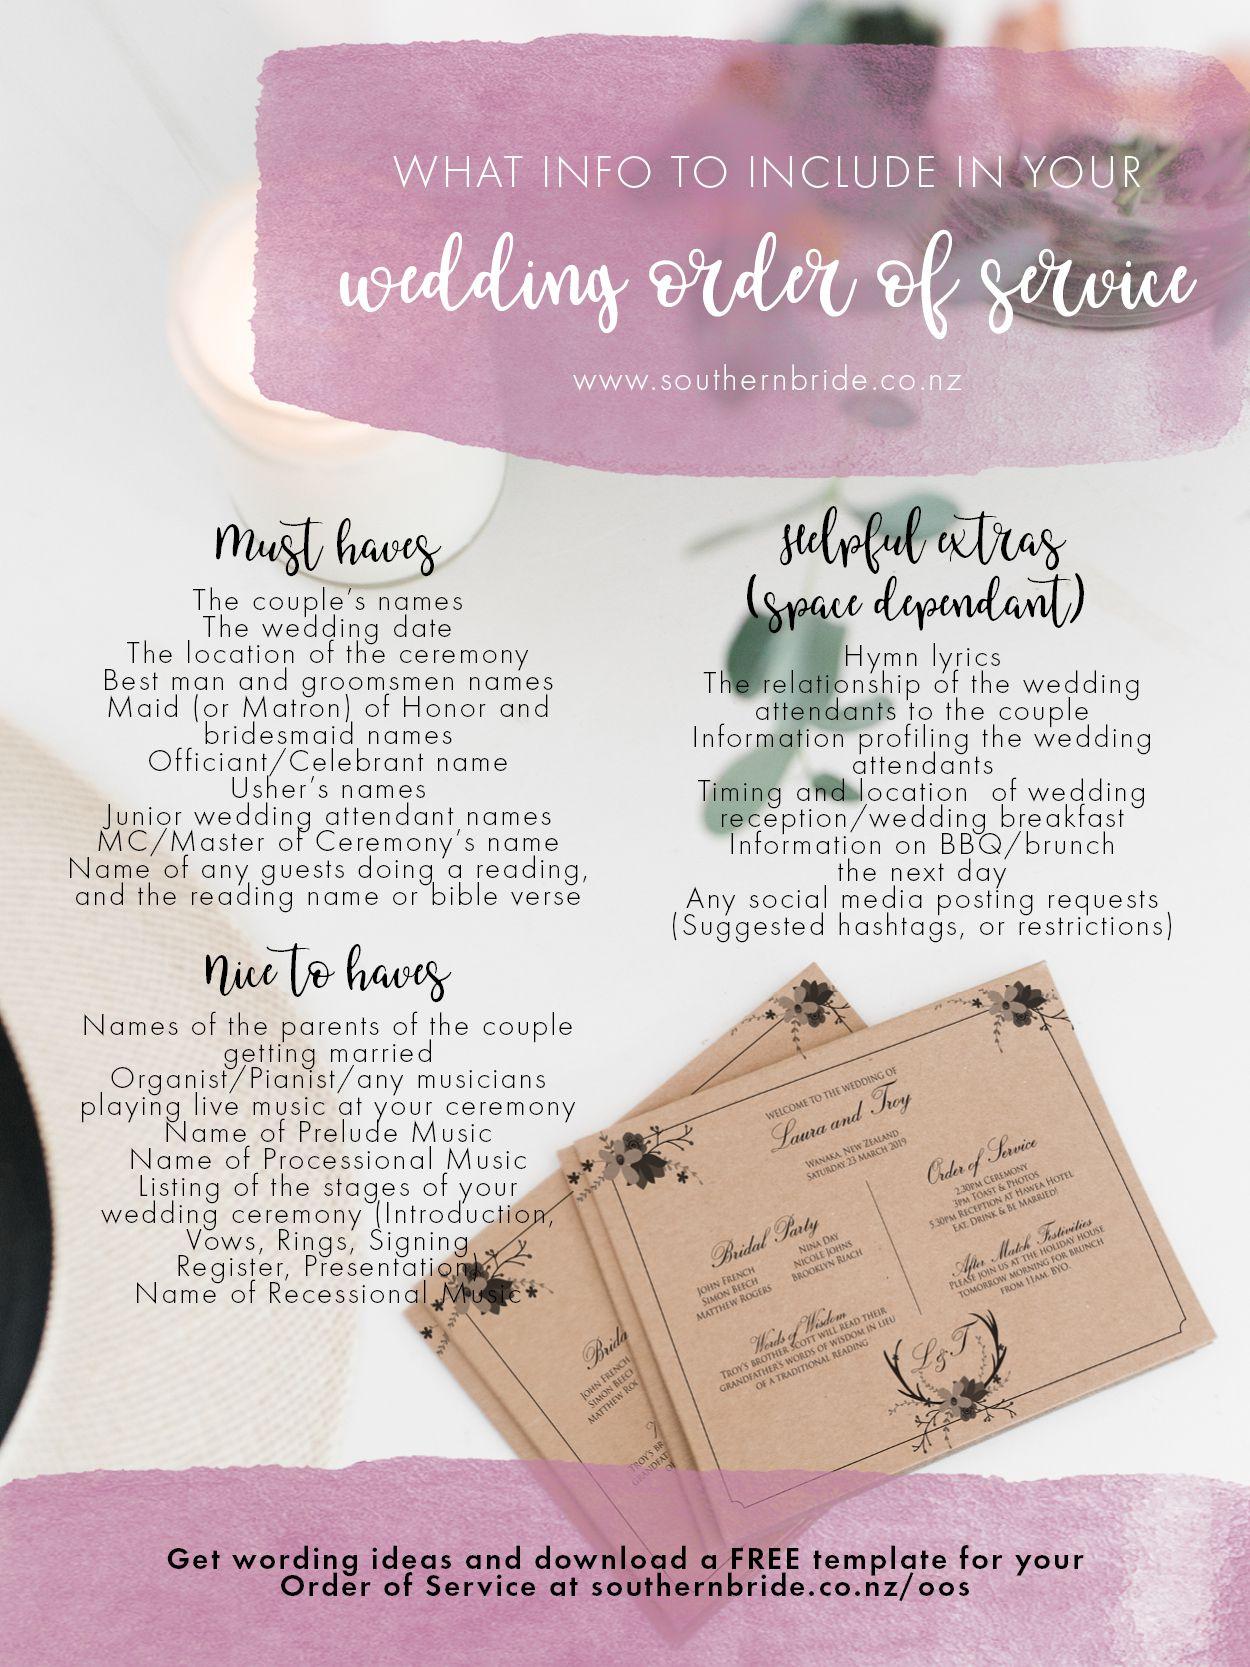 009 Impressive Wedding Order Of Service Template High Def  Church Free Microsoft Word DownloadFull